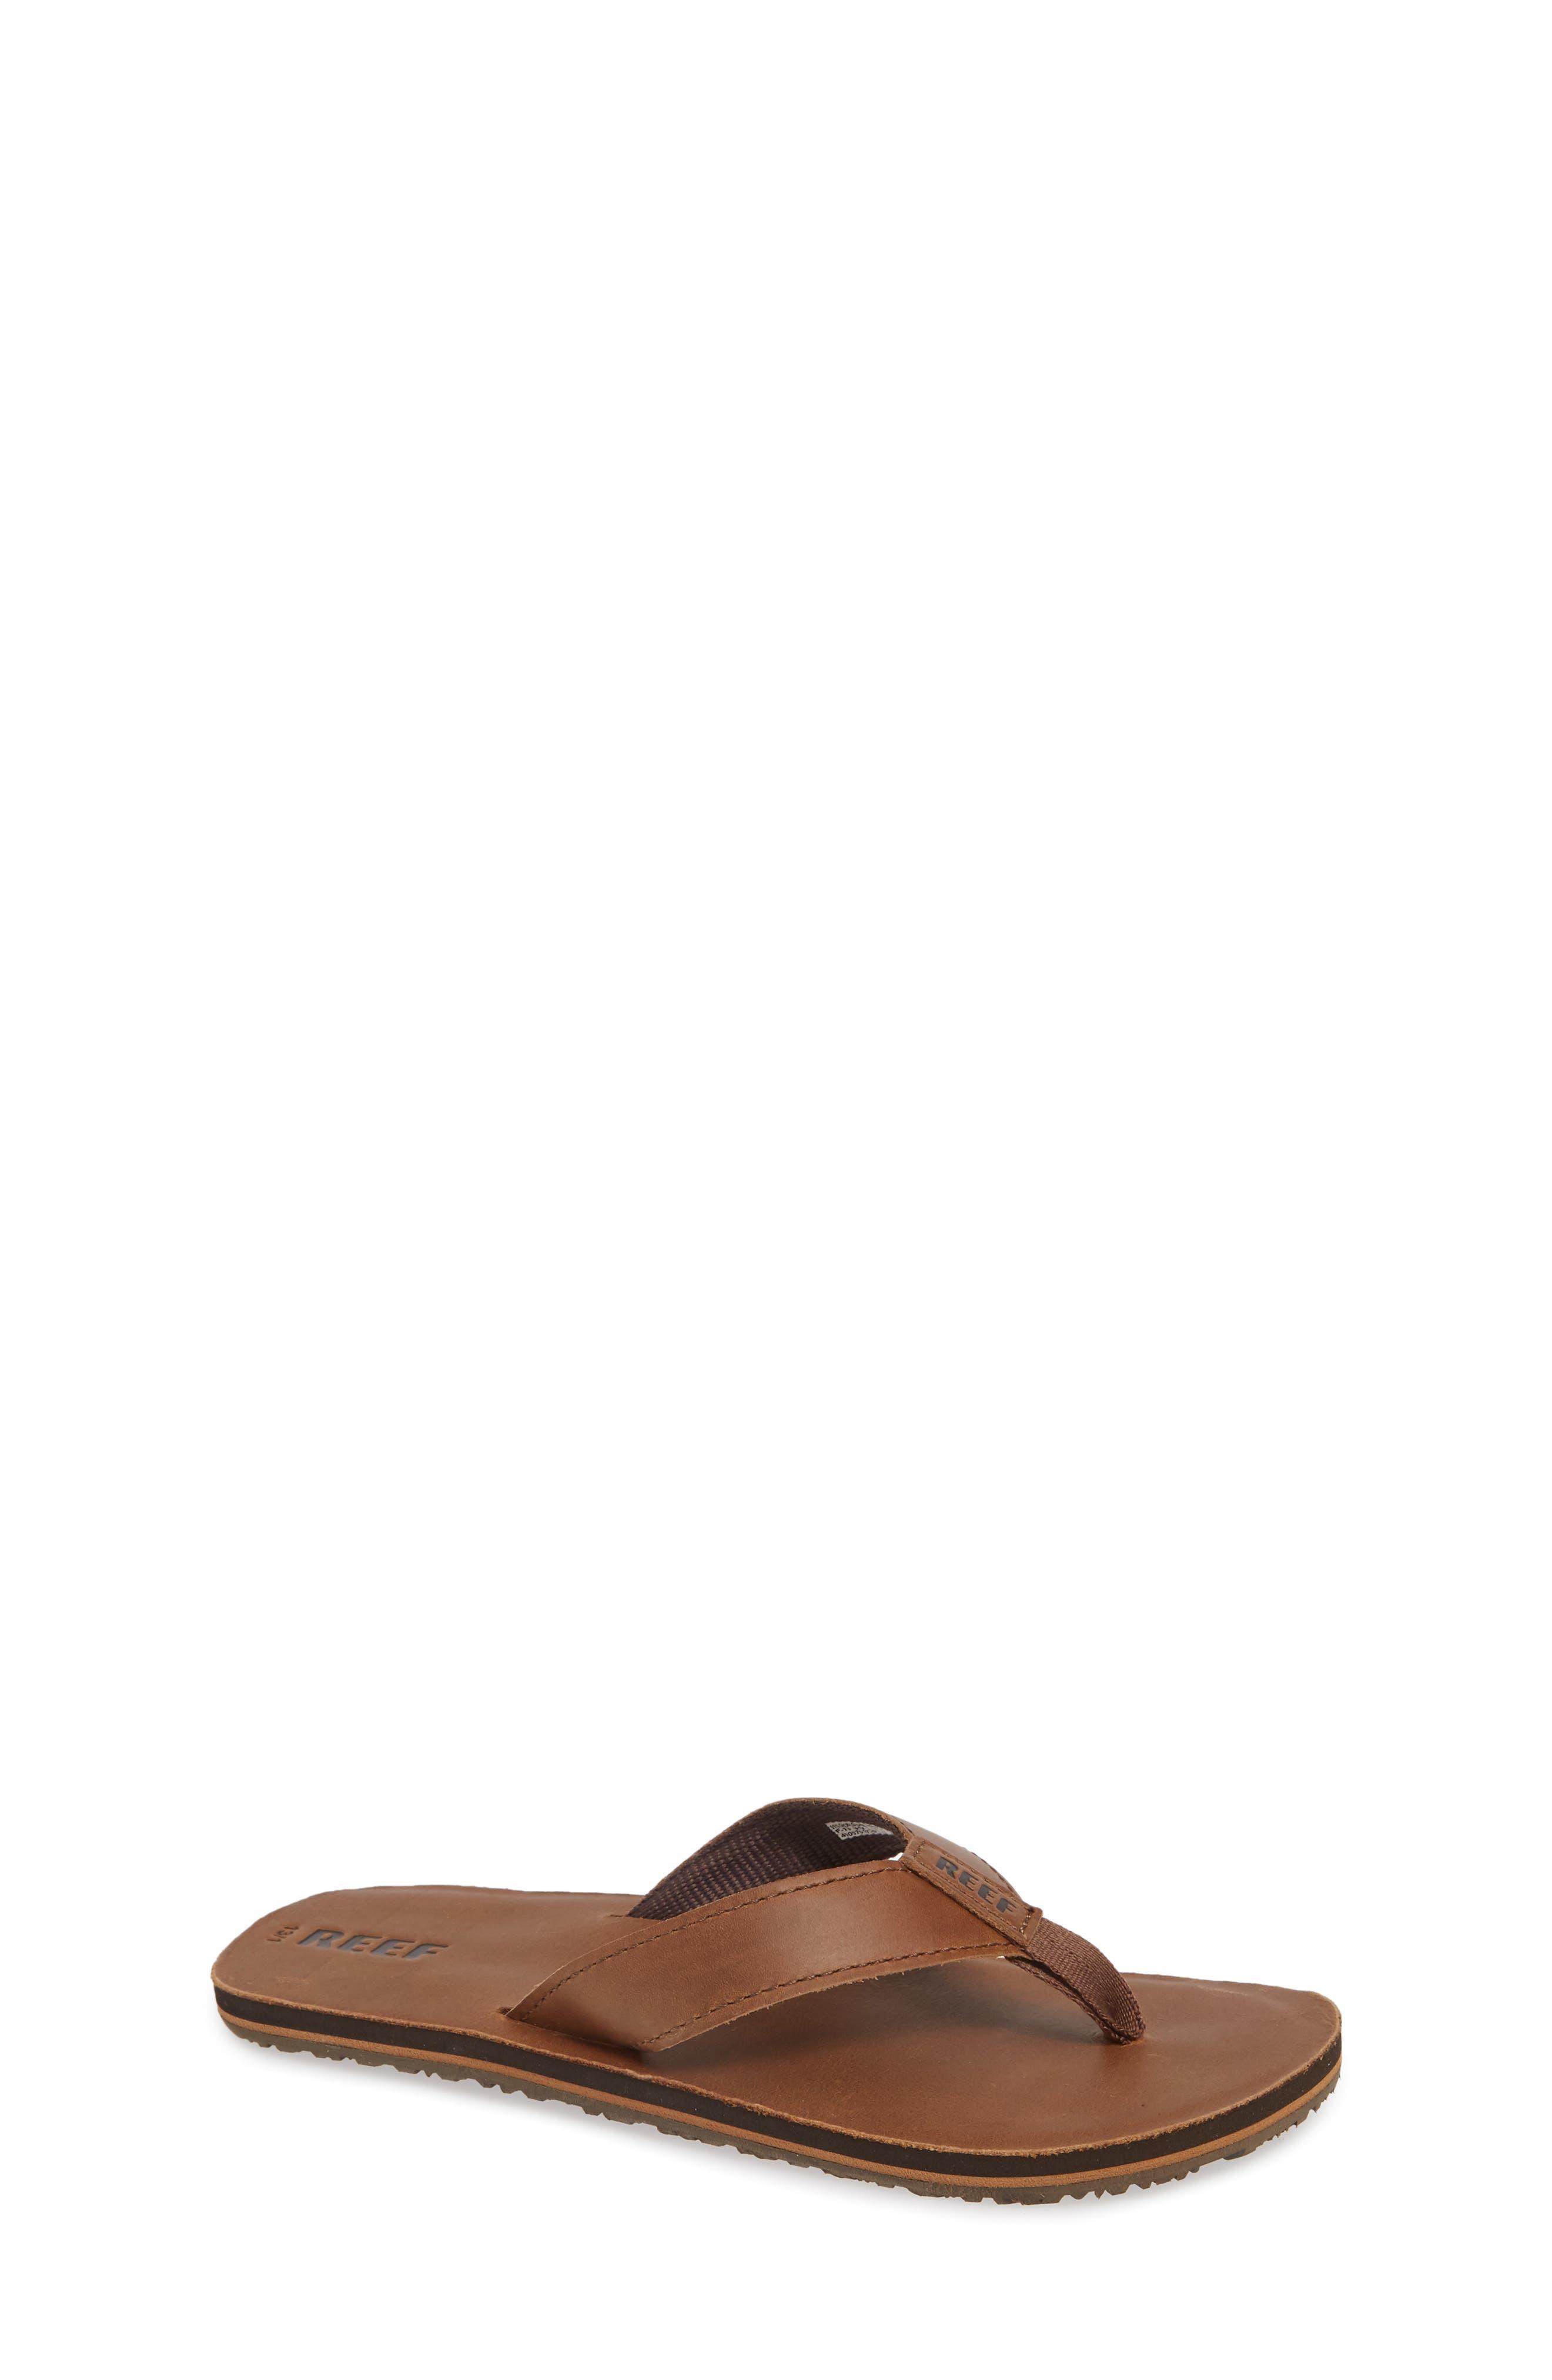 REEF Smoothy Flip Flop, Main, color, BRONZE BROWN